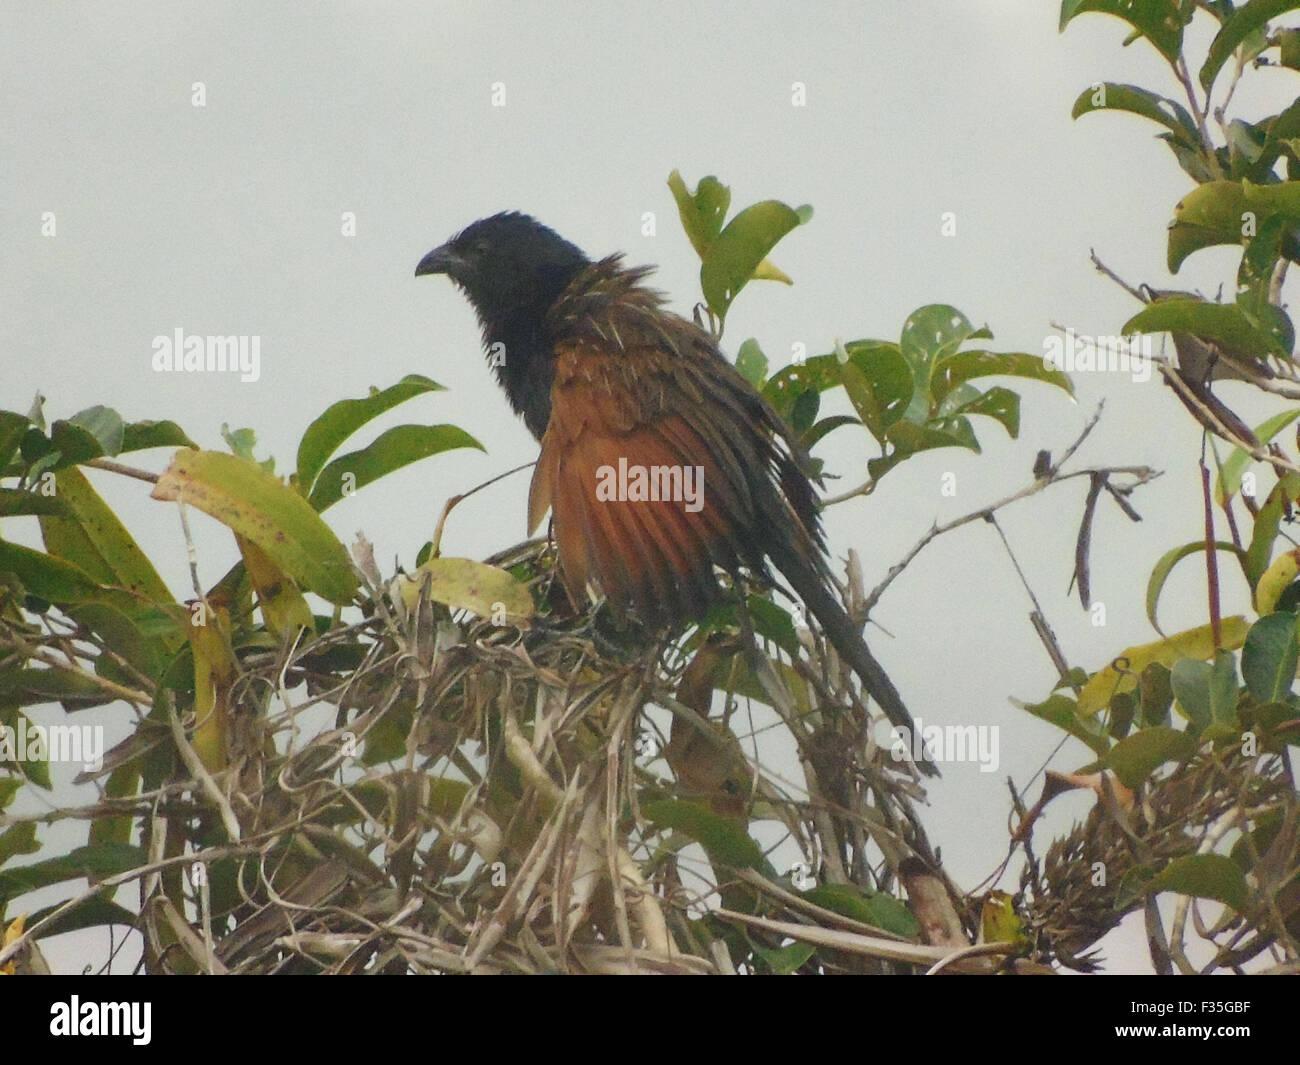 Bintan, Riau Islands, Indonesia. 30th Sep, 2015. BINTAN, INDONESIA - SEPTEMBER 30: The greater coucal or crow pheasant - Stock Image